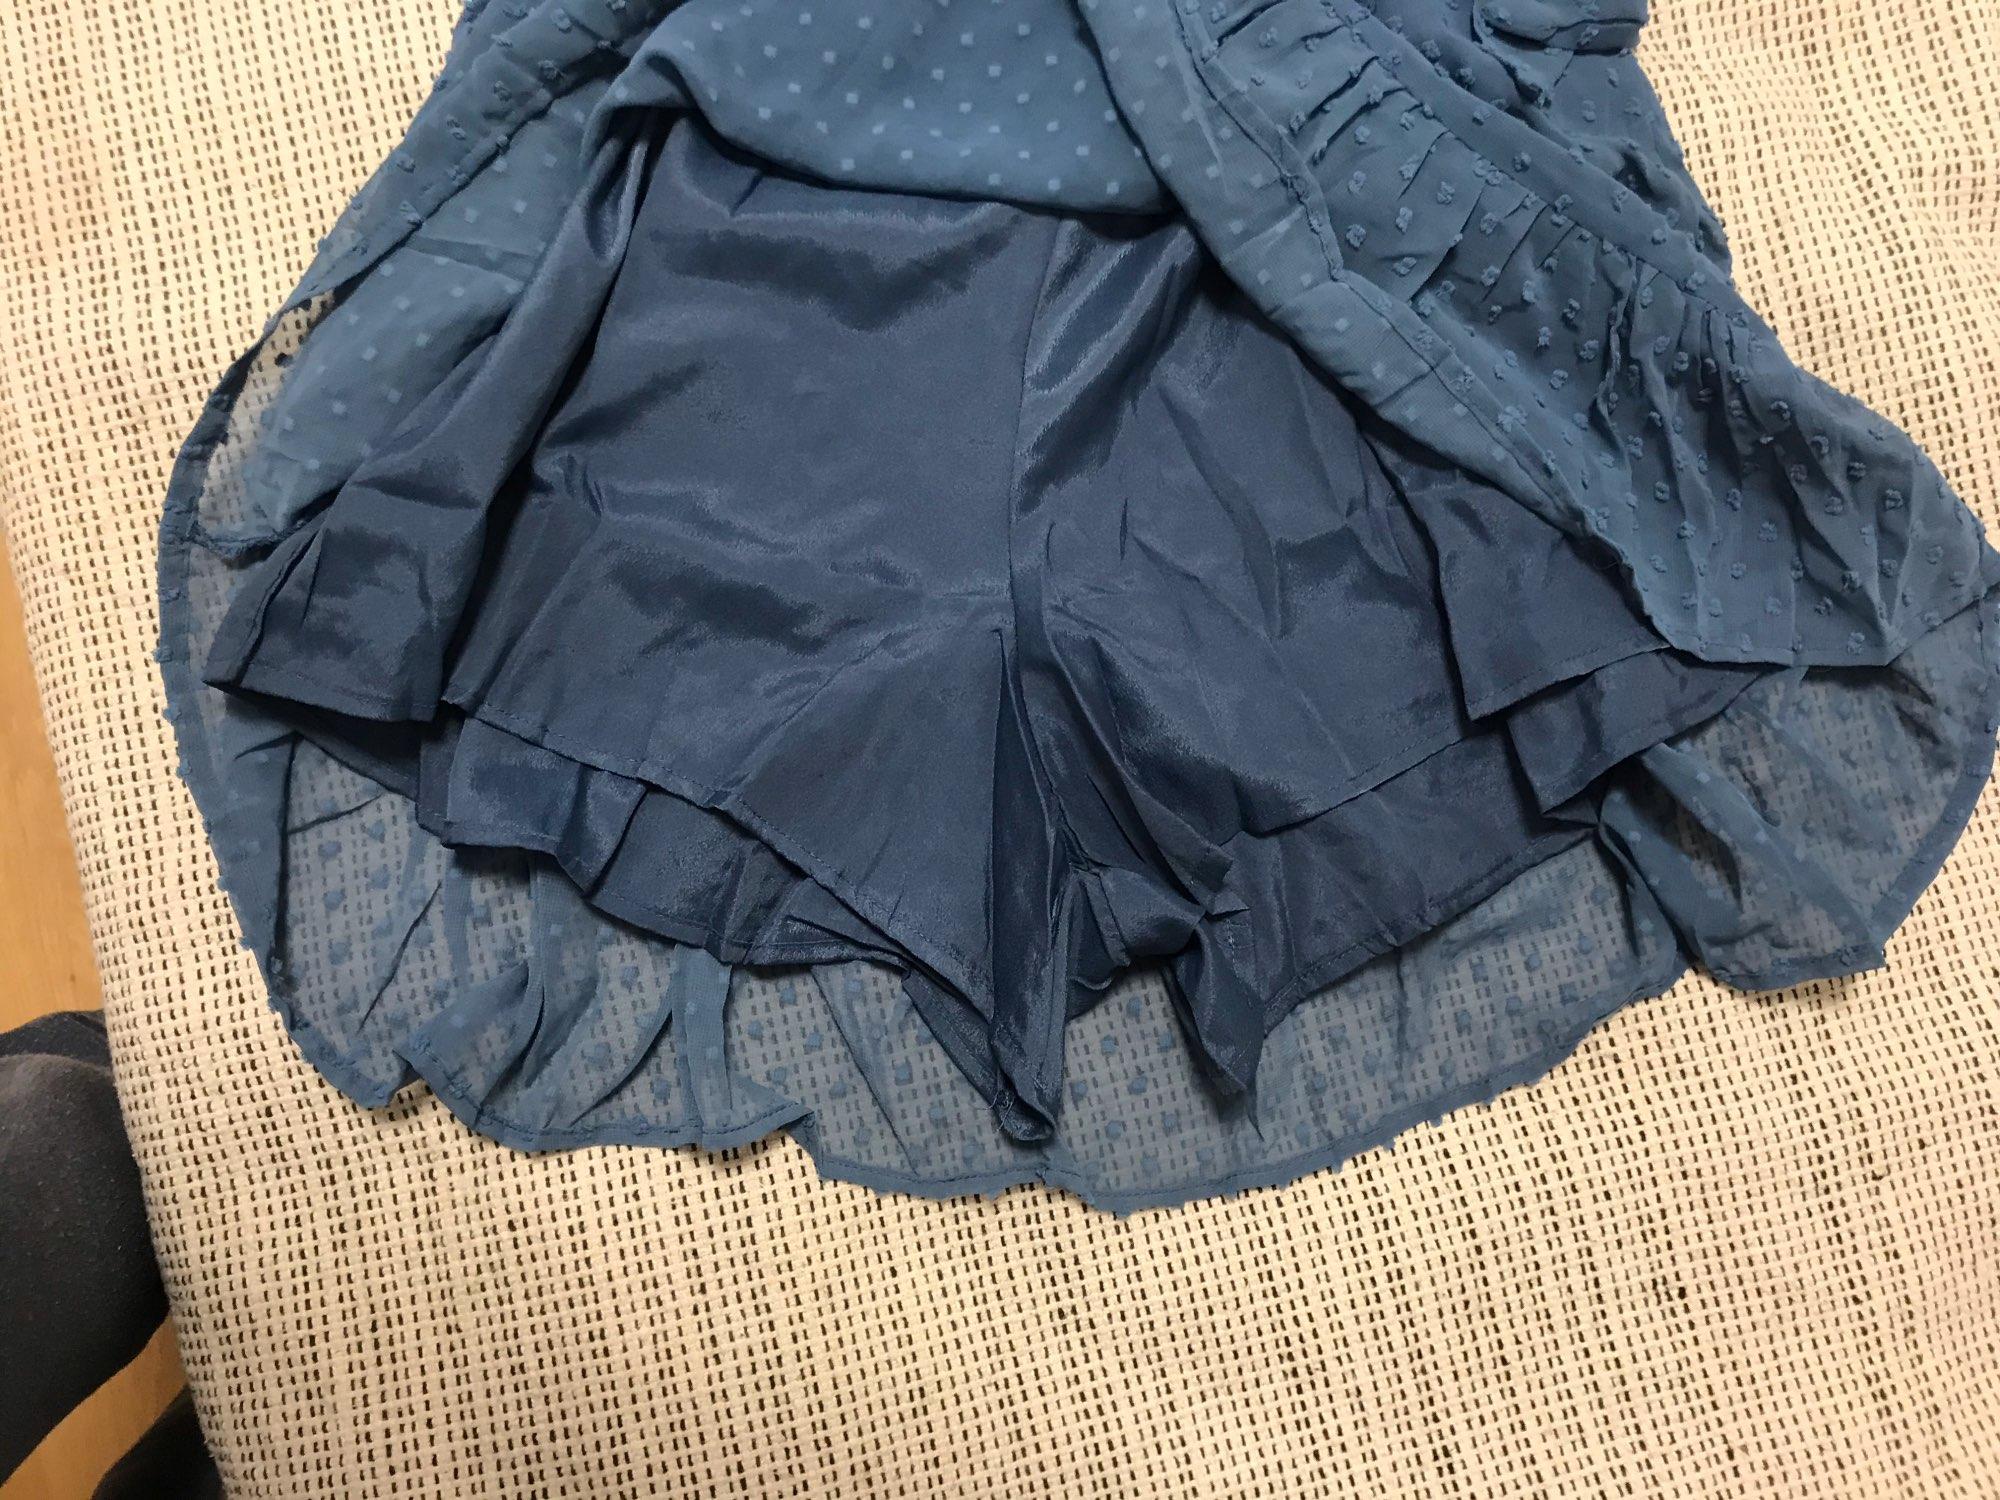 Aachoae 2021 Summer Women Ruffles Lace Chiffon Dress Boho Mini Beach Dress Three Quarter Sleeve Ladies Party Dresses Vestido|Dresses|   - AliExpress